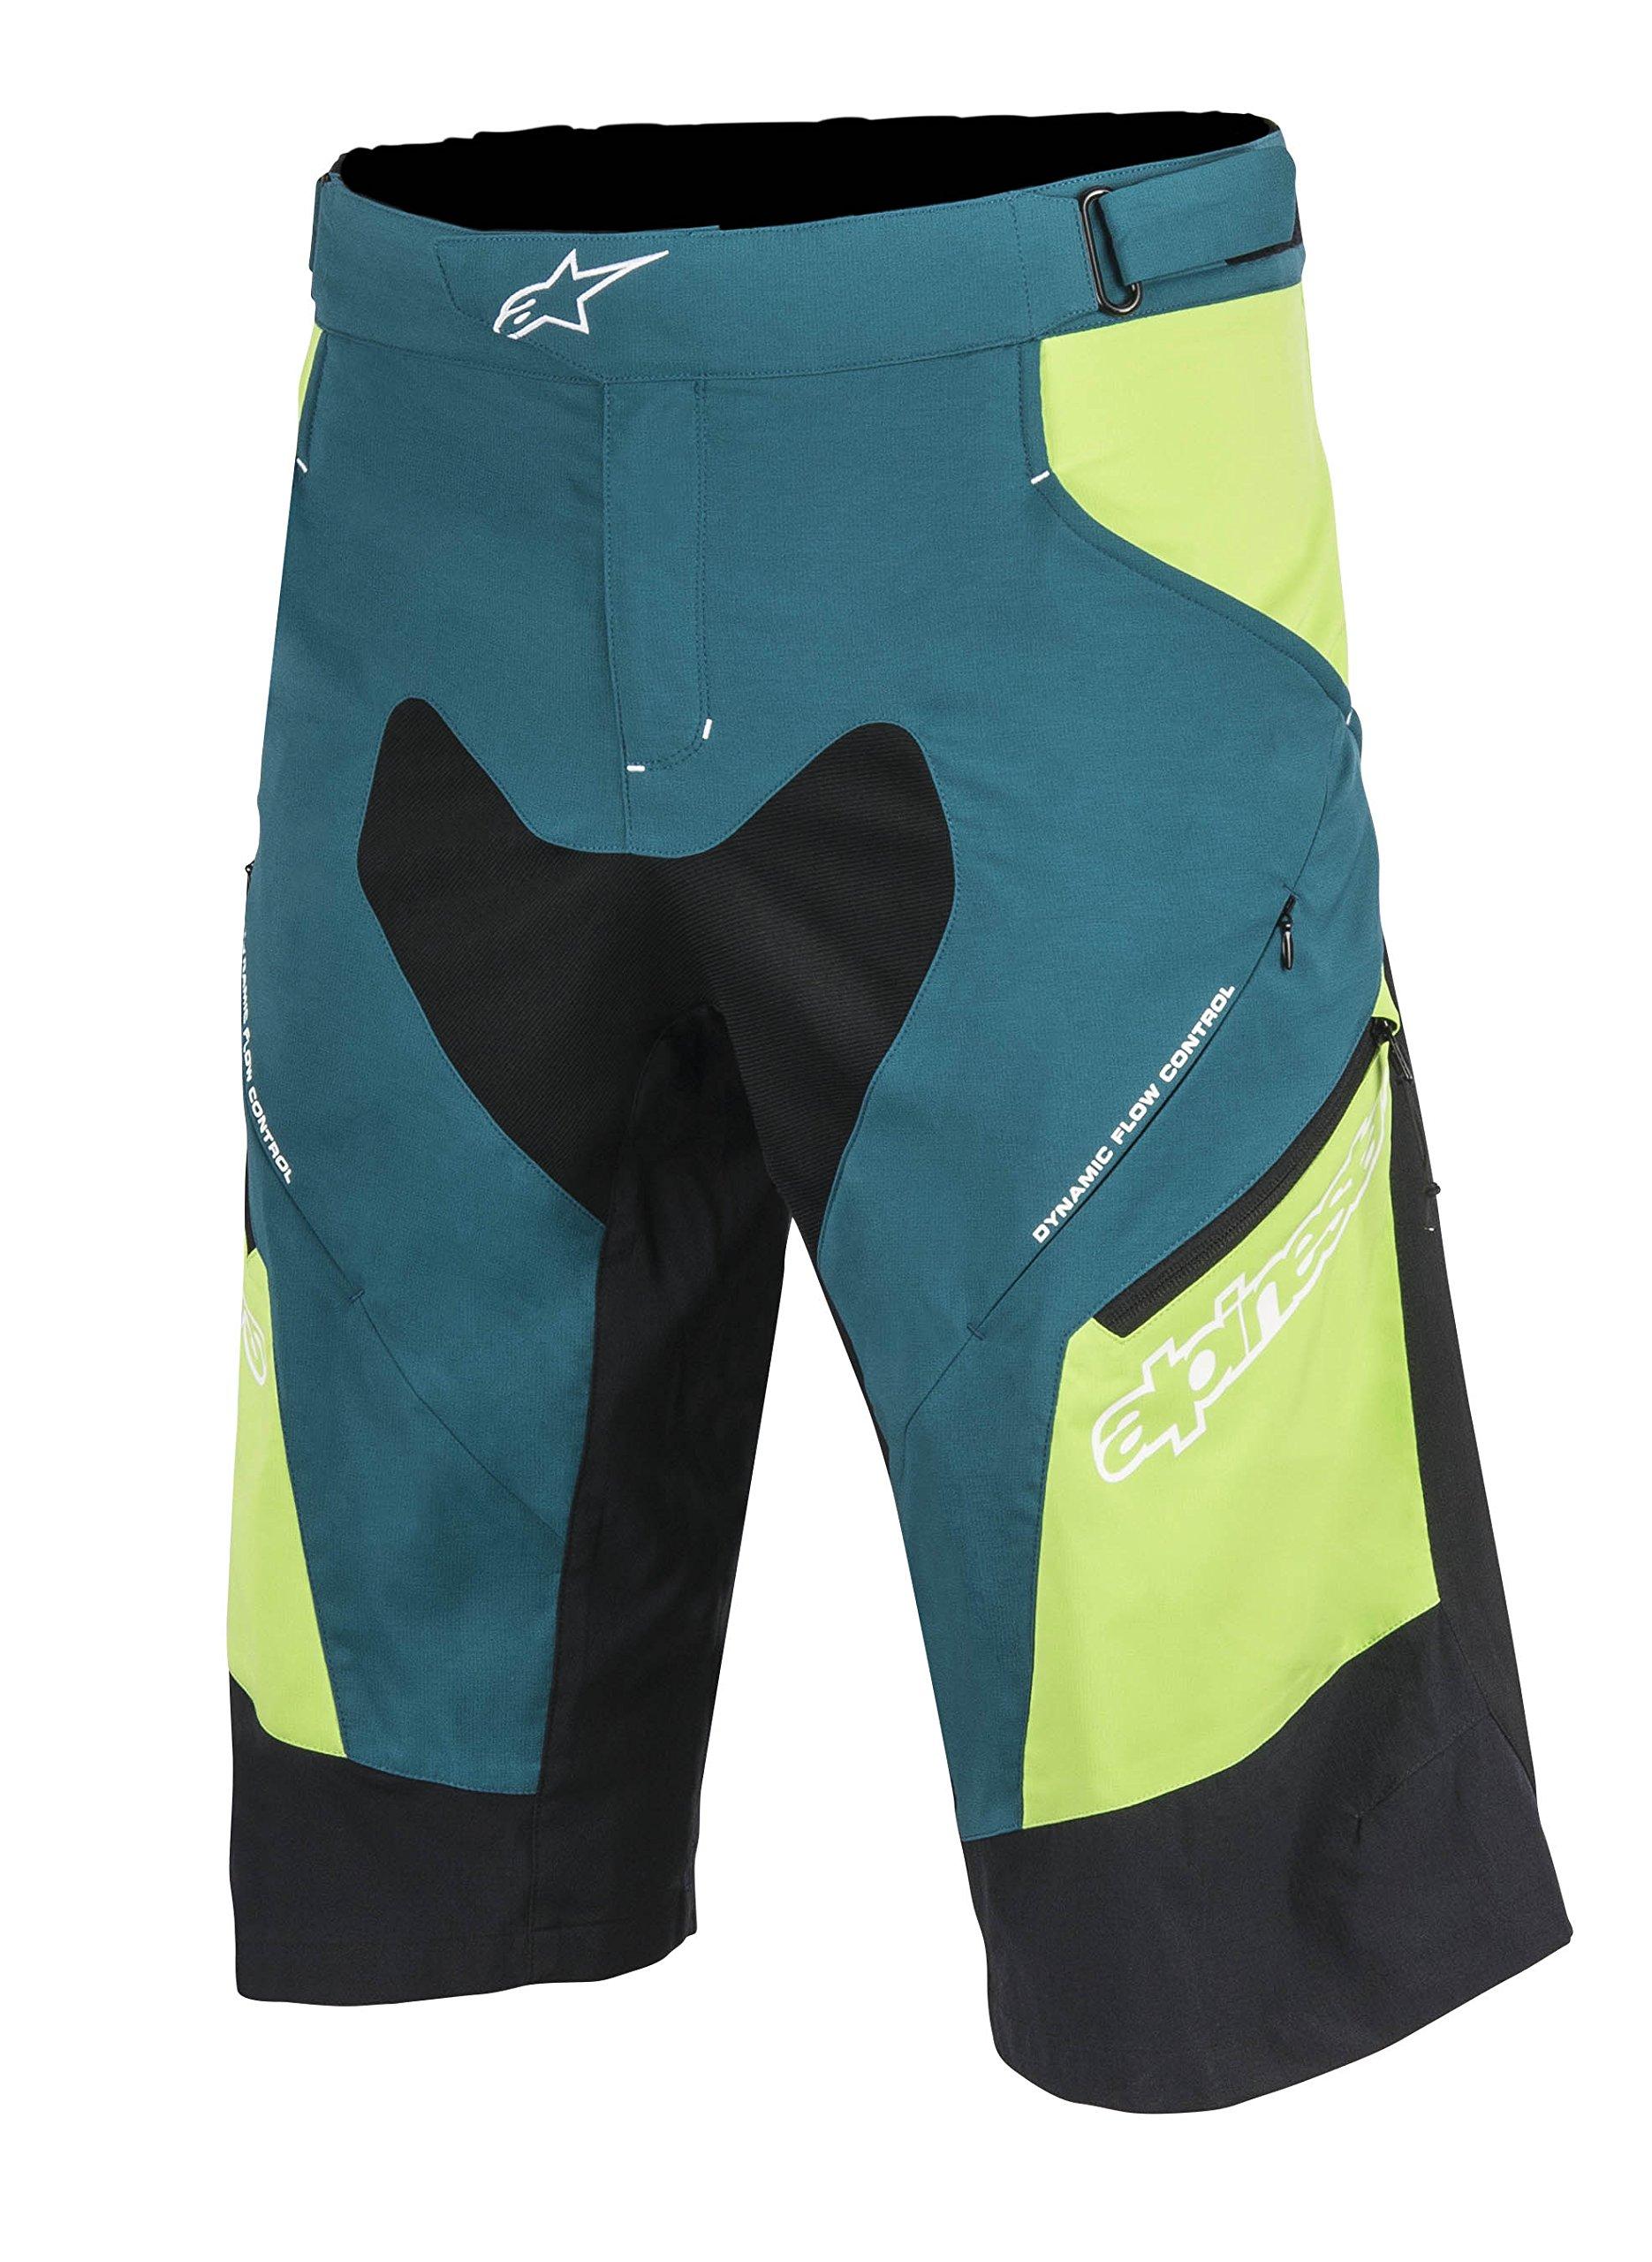 Galleon - Alpinestars Drop 2 Shorts, Shaded Spruce Green